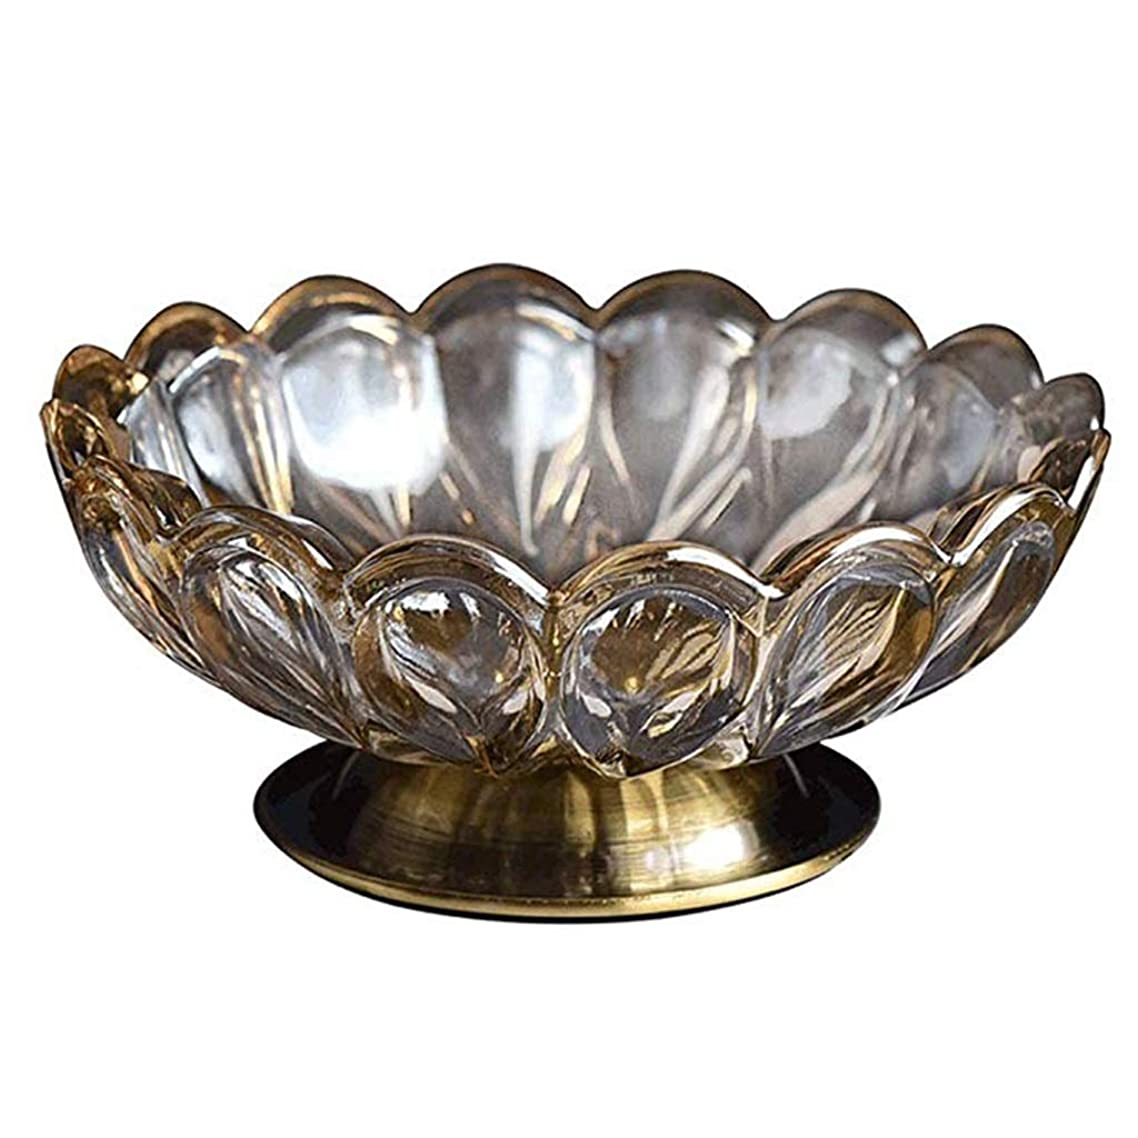 DAFY Creative Ashtray Metal Glass Home Decoration Bedroom Melon Fruit Plate European Fruit Bowl Dried Fruit Bowl Ashtray 166.5cm